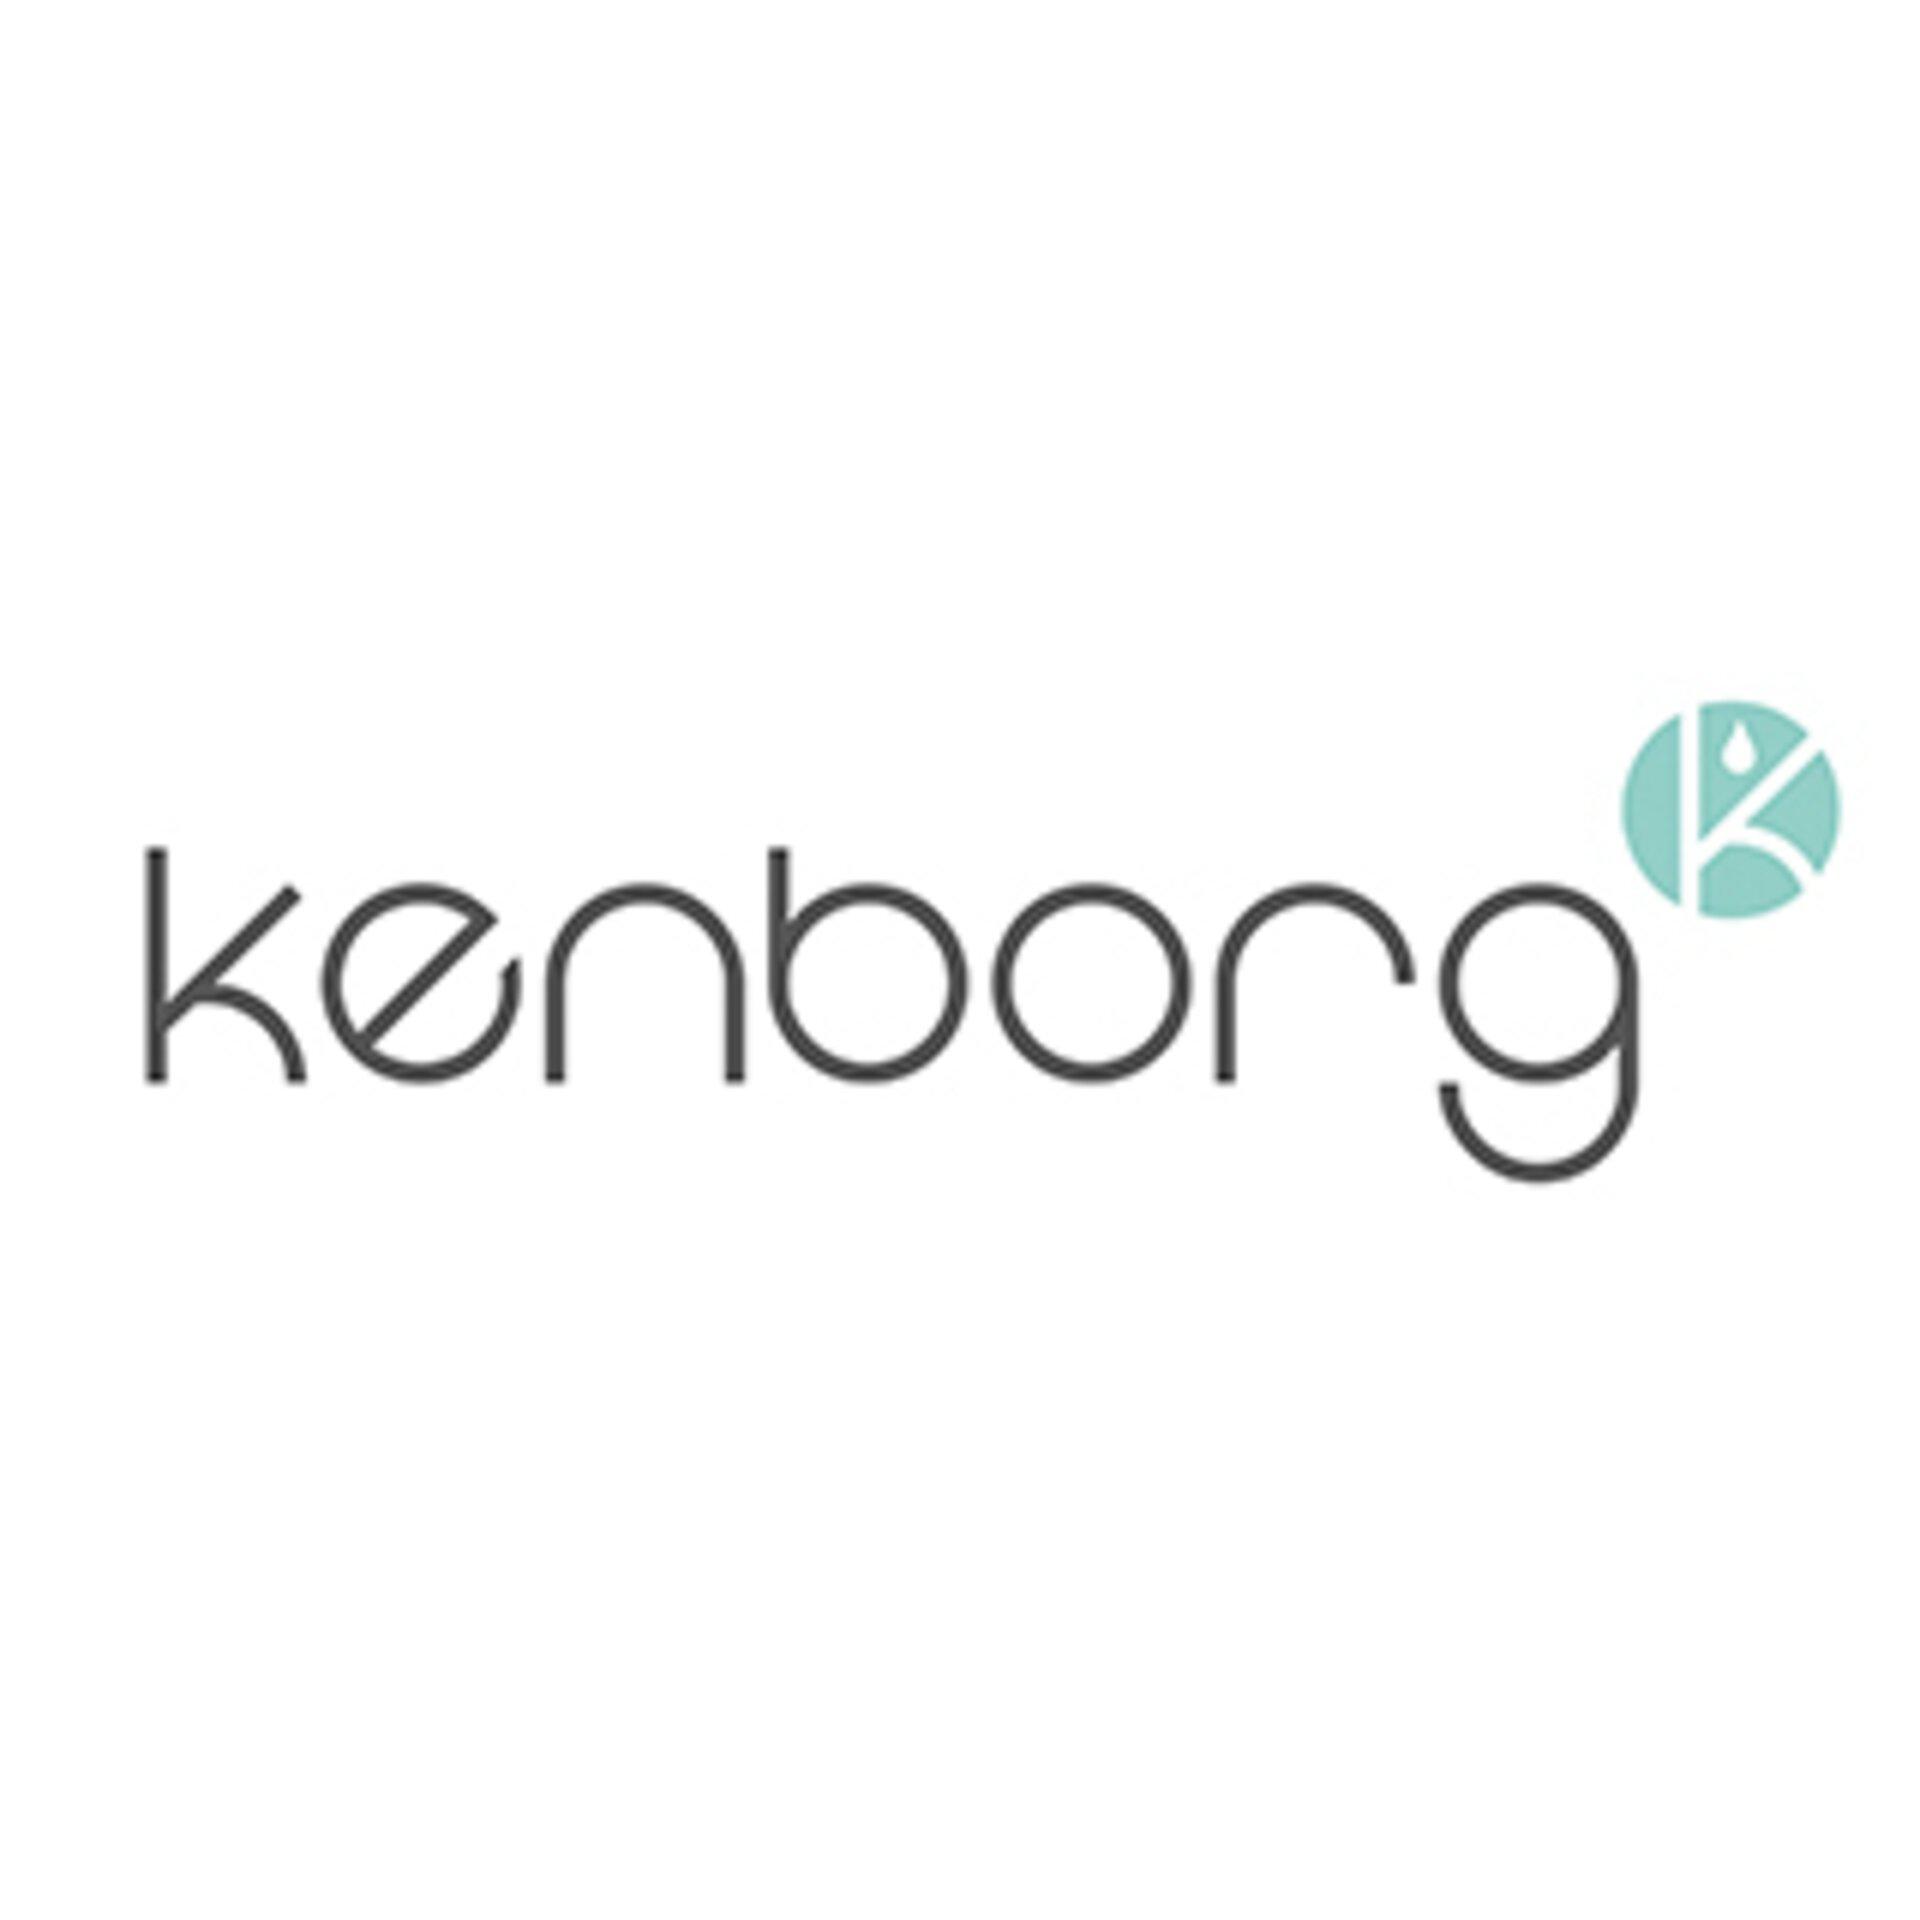 Kenborg